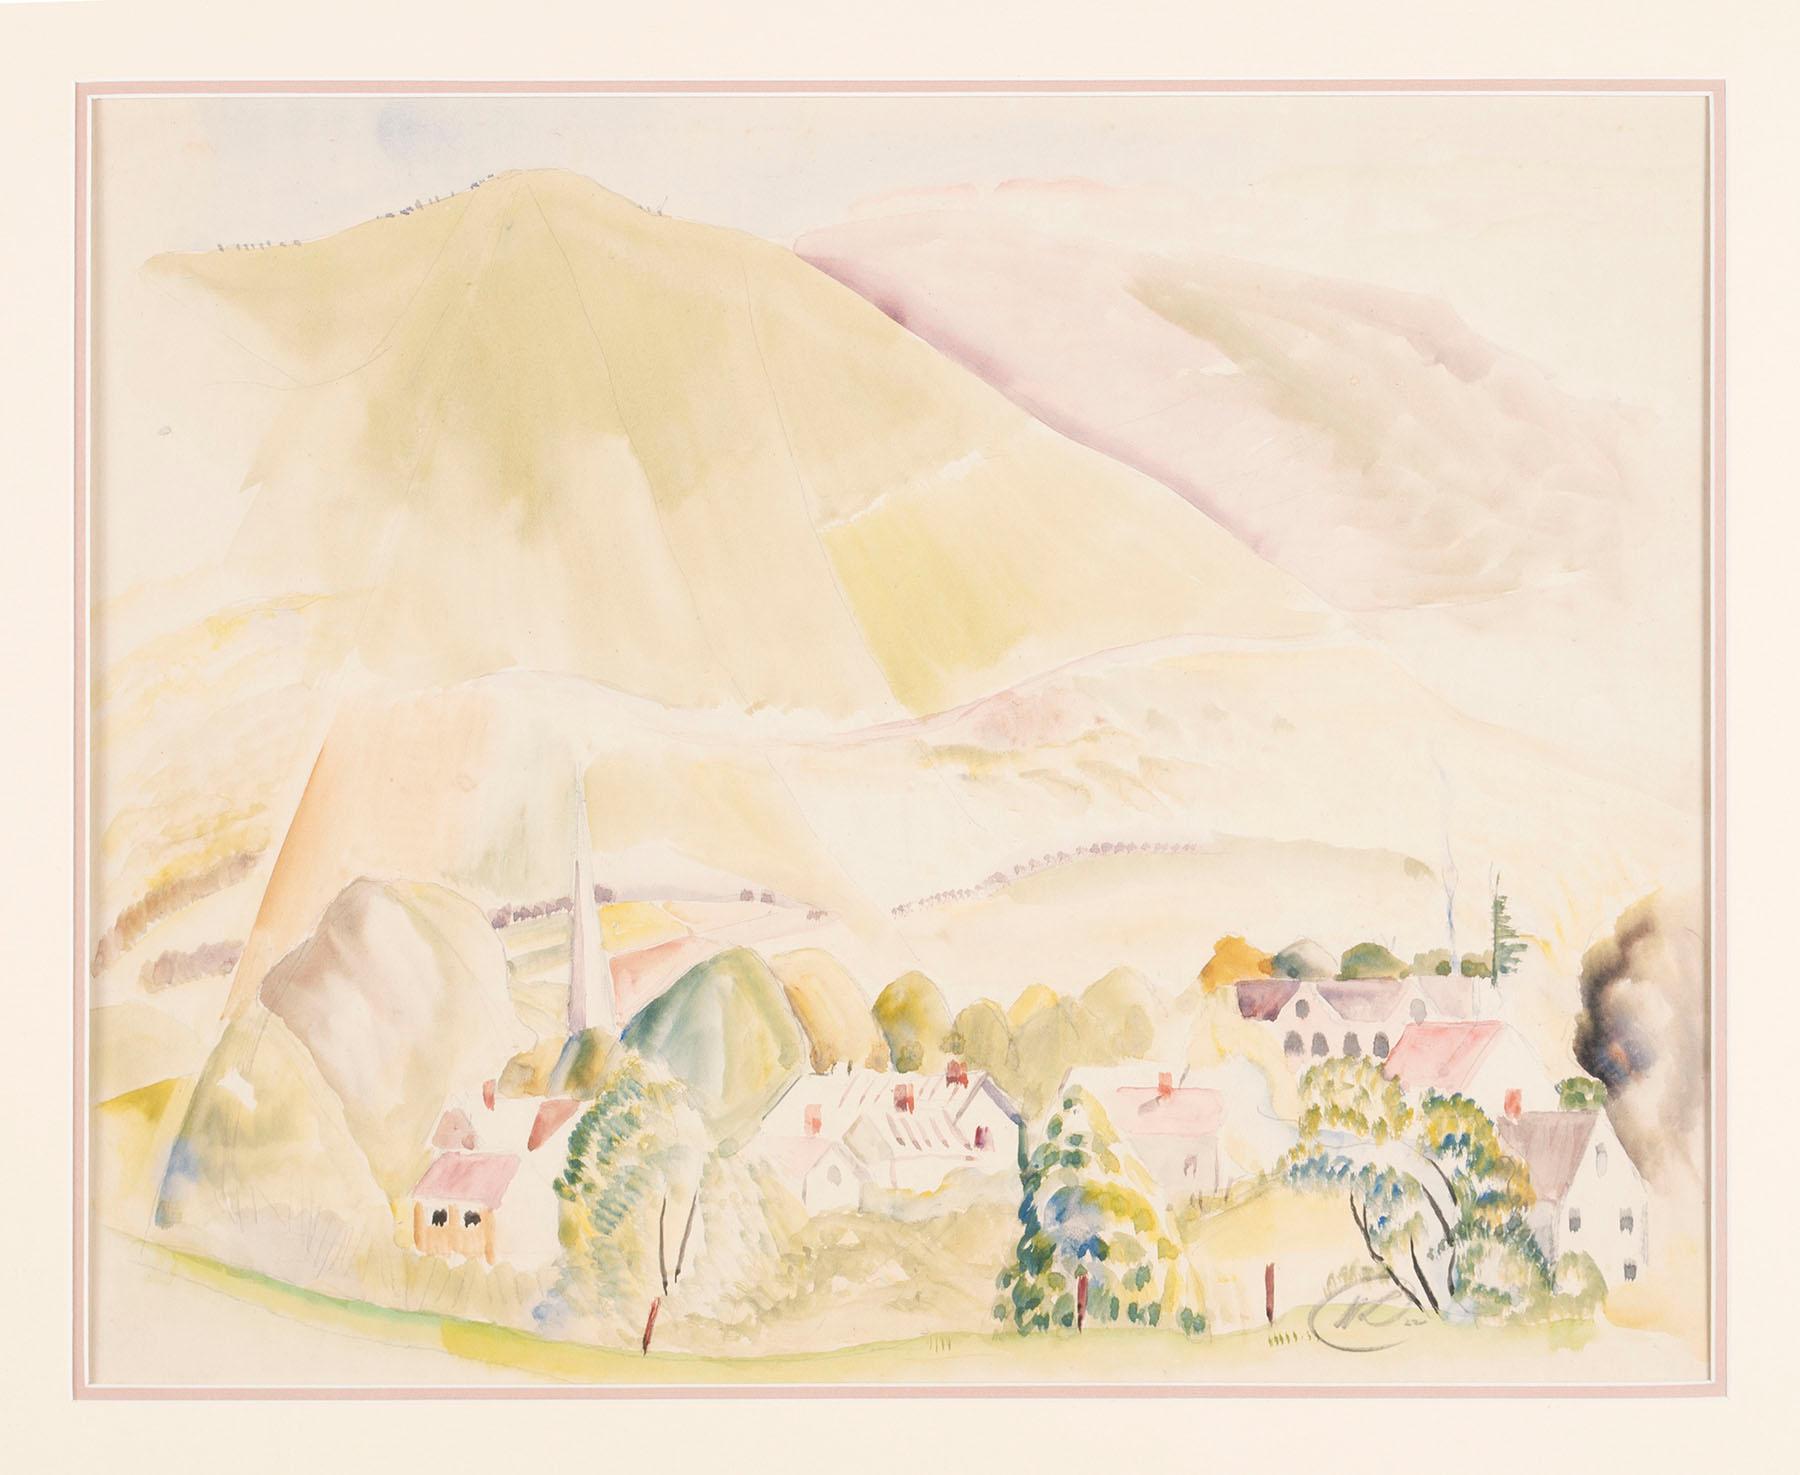 HAYLEY LEVER (AUSTRALIAN/AMERICAN, 1876-1958)